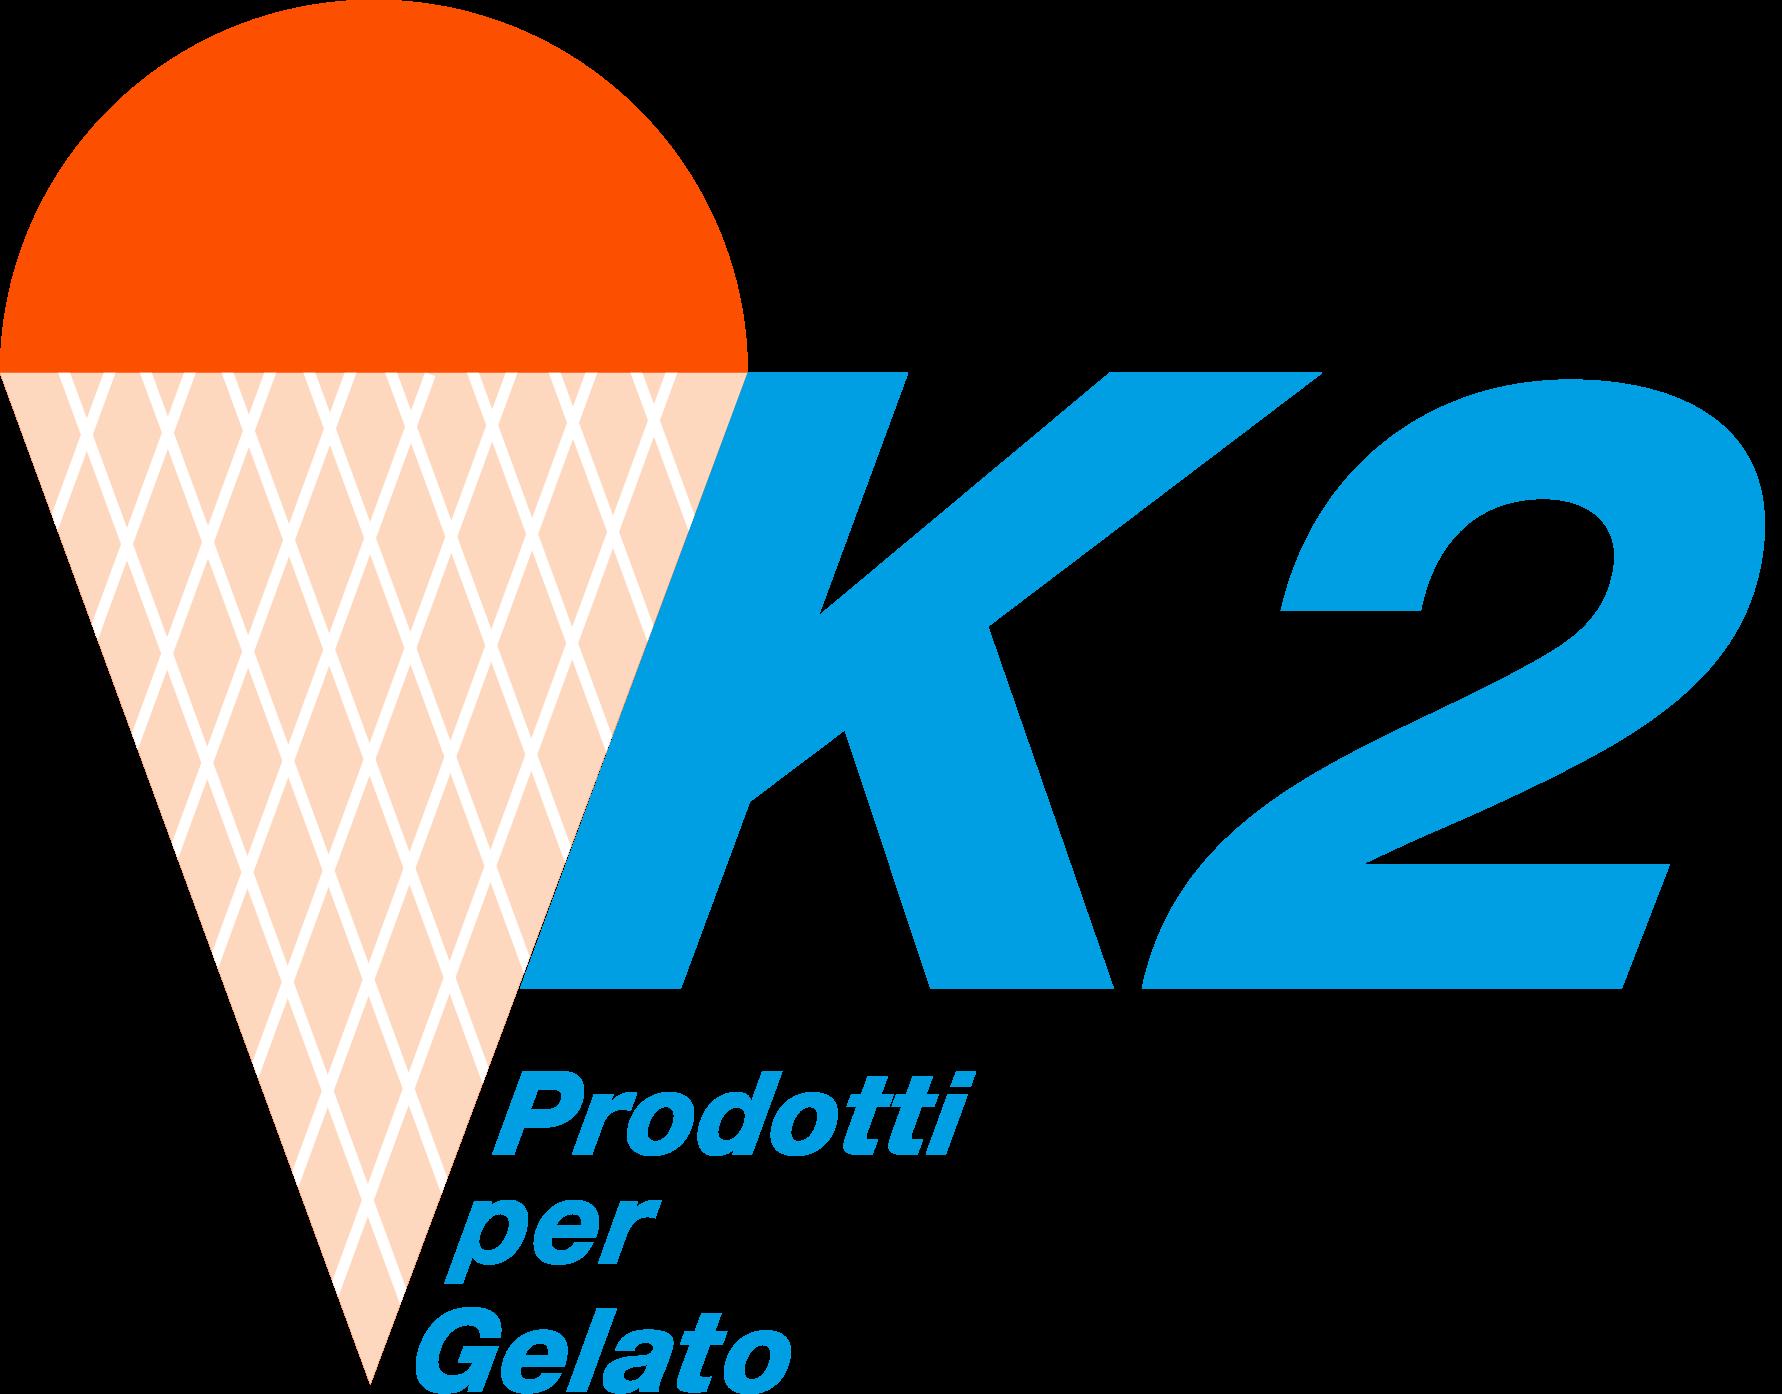 Logo Geleto K2